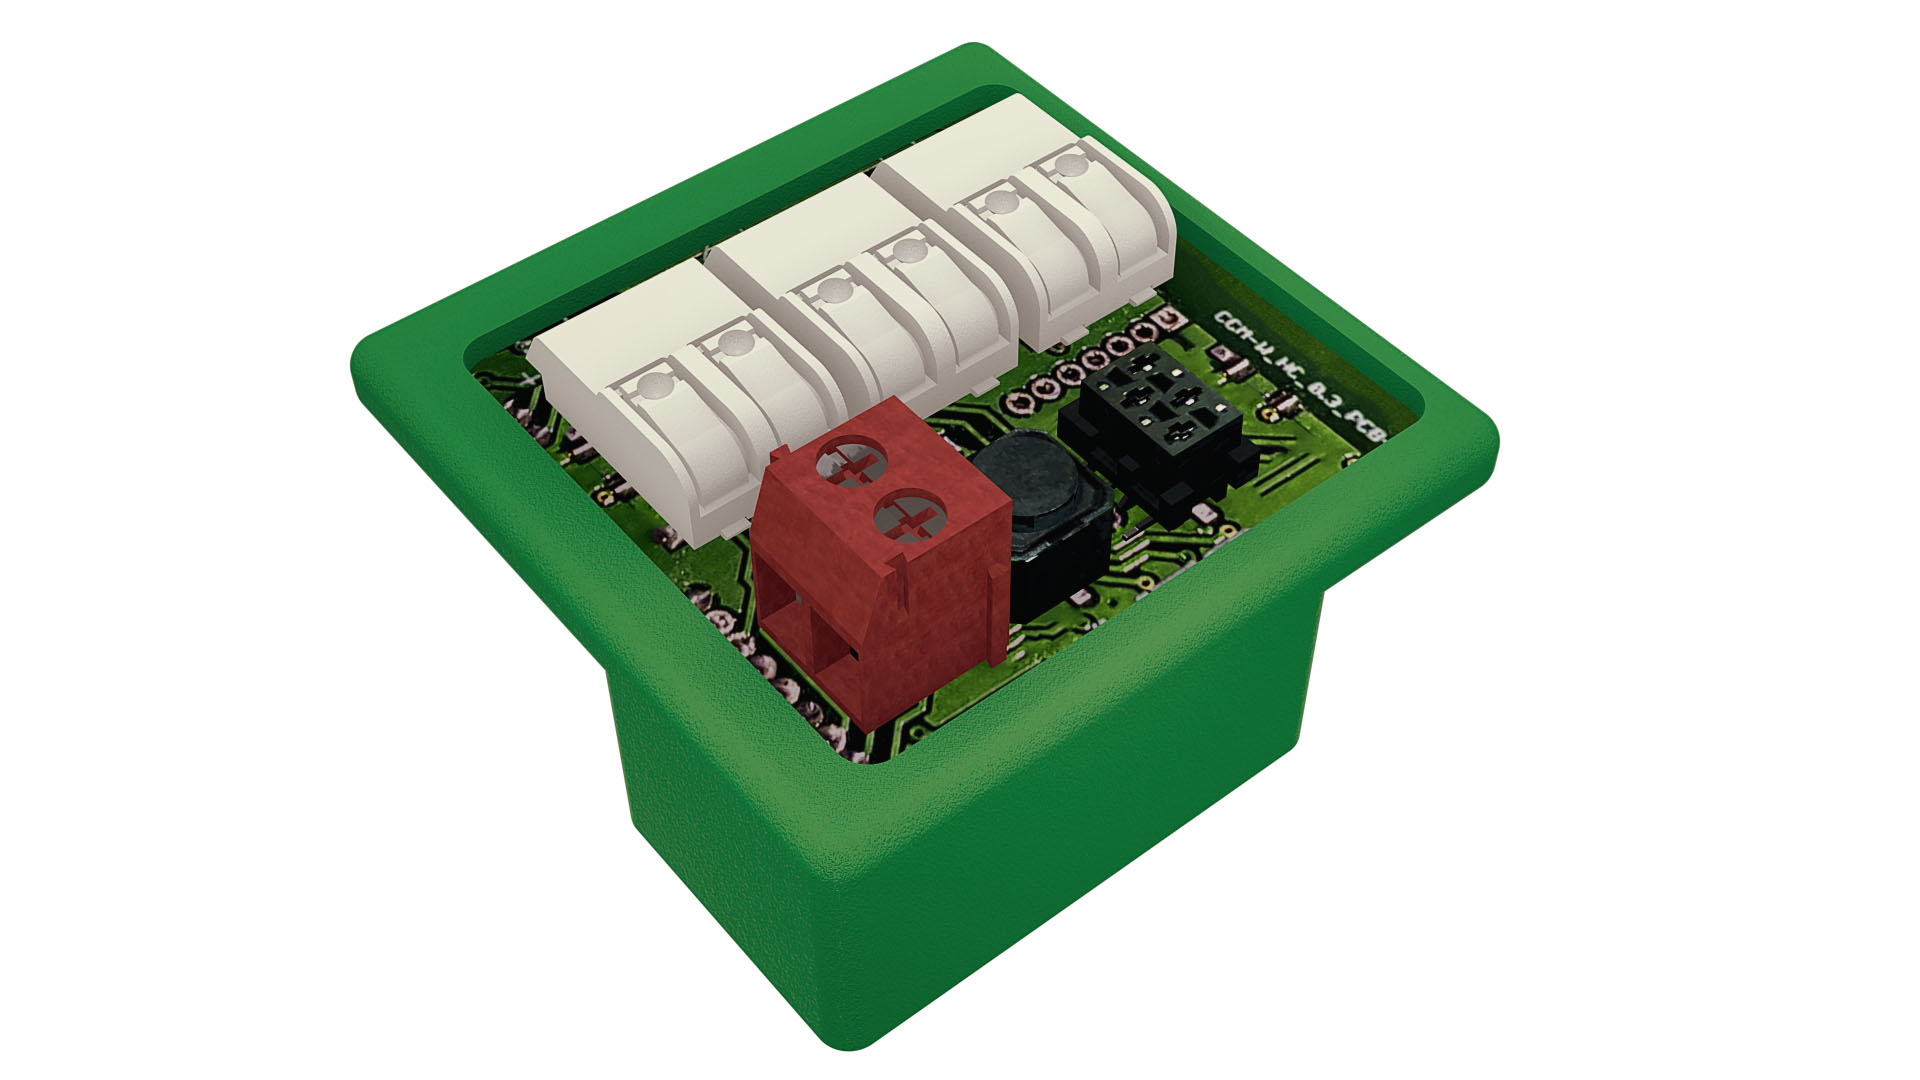 Medidor de consumo eléctrico wifi CcM-W HC